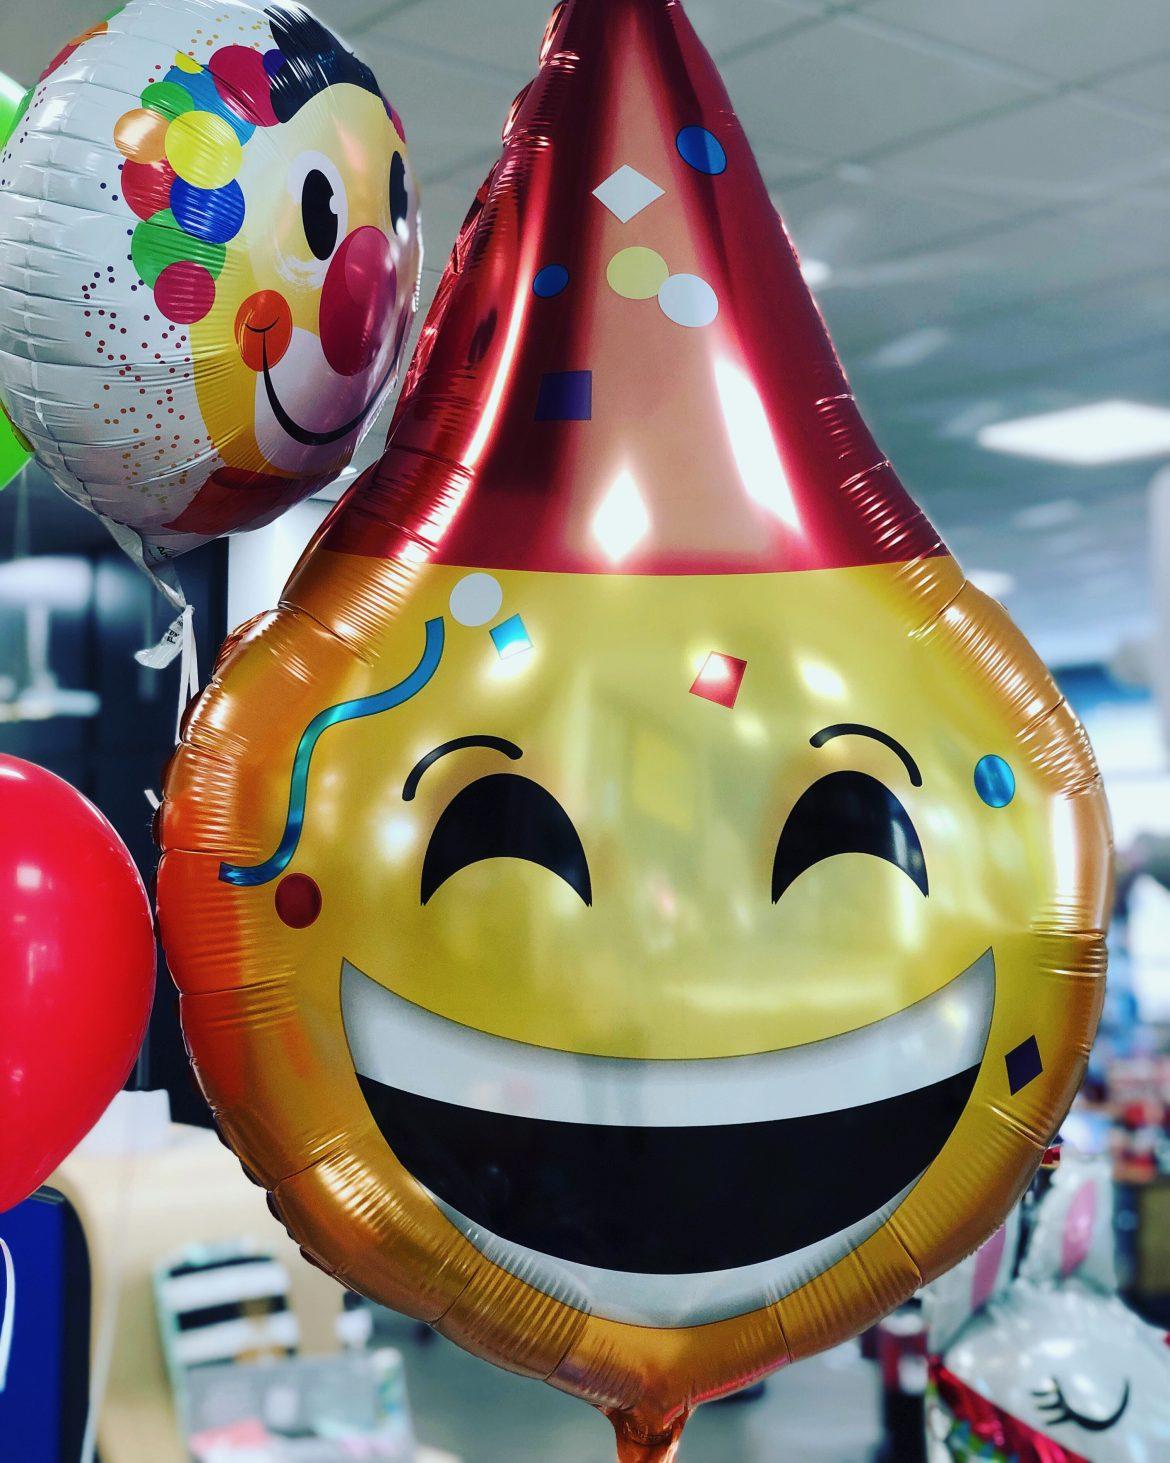 Heliumballon lachender Smiley